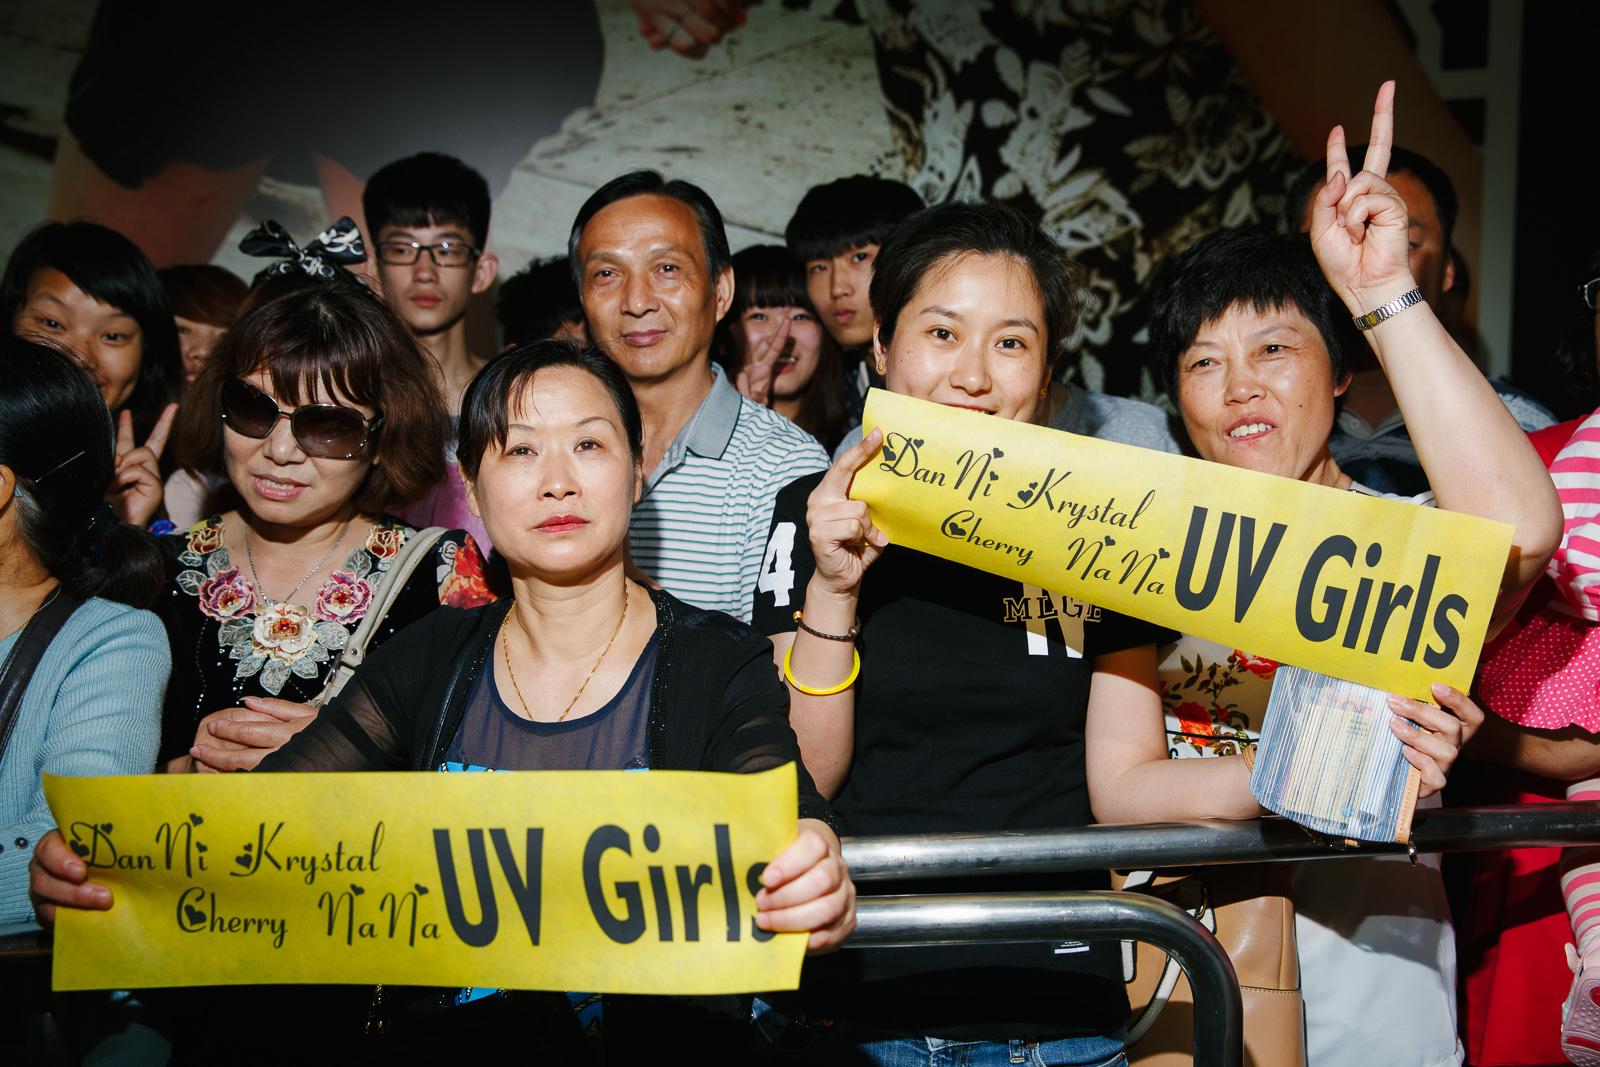 20140609_UV_Girls_00467.jpg